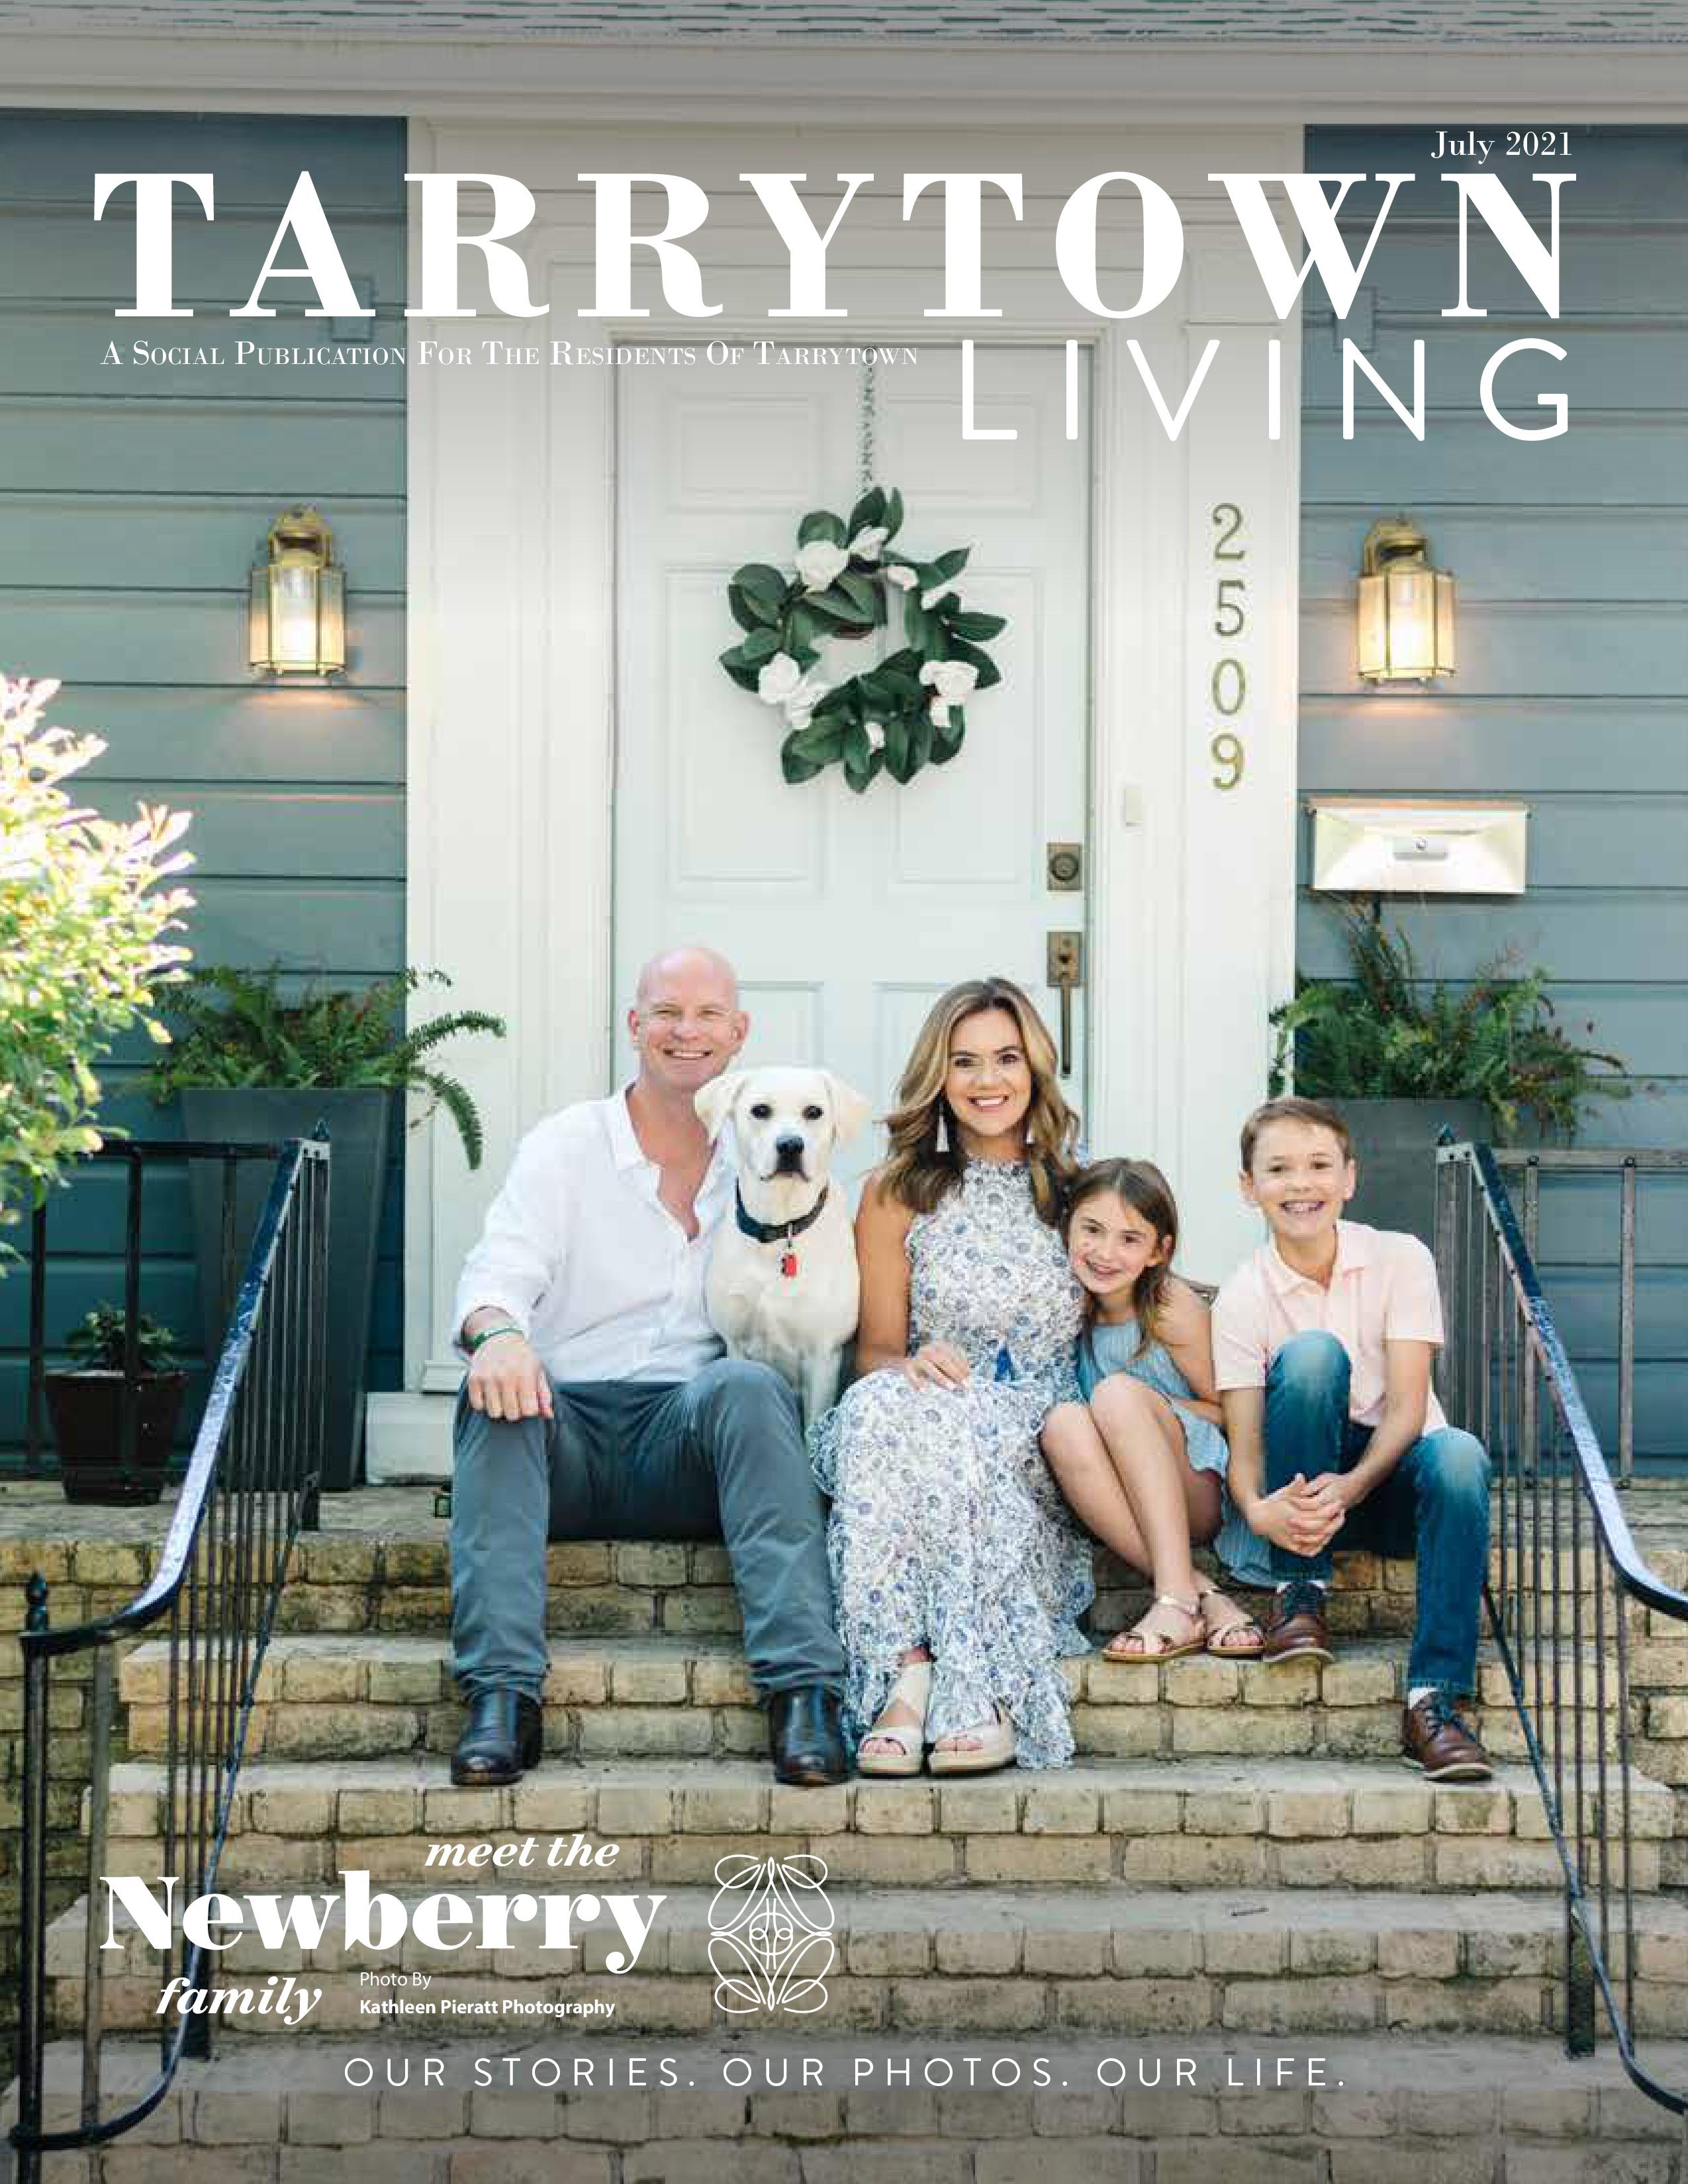 Tarrytown Living 2021-07-01